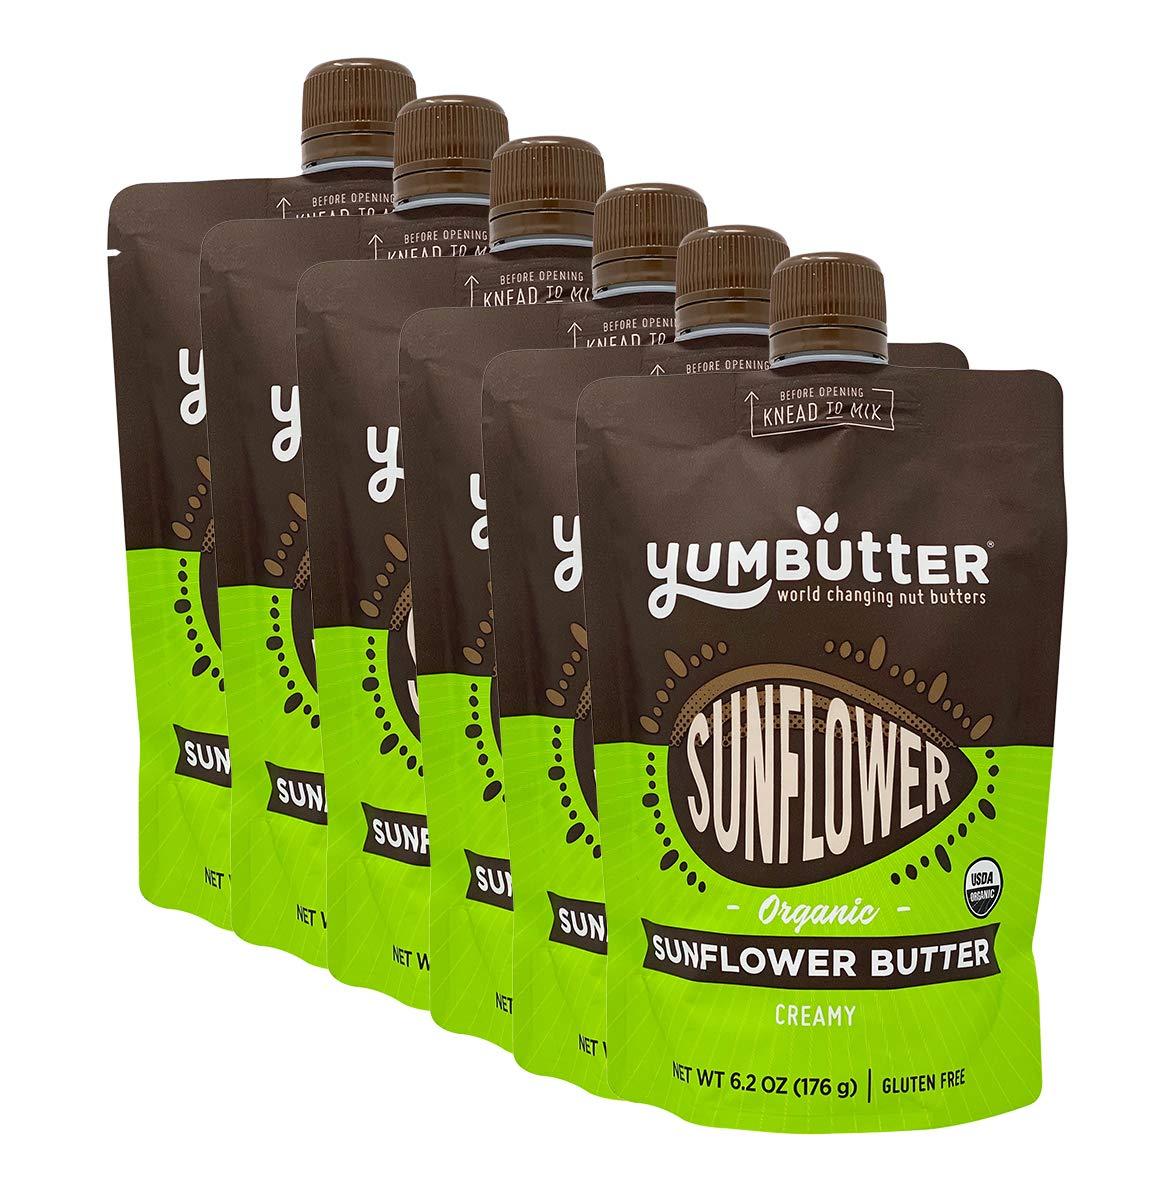 Organic Sunflower Butter by Yumbutter, Creamy Seed Butter, USDA Organic, Gluten Free, Vegan, Non GMO, 6.2oz Pouch (Pack of 6)